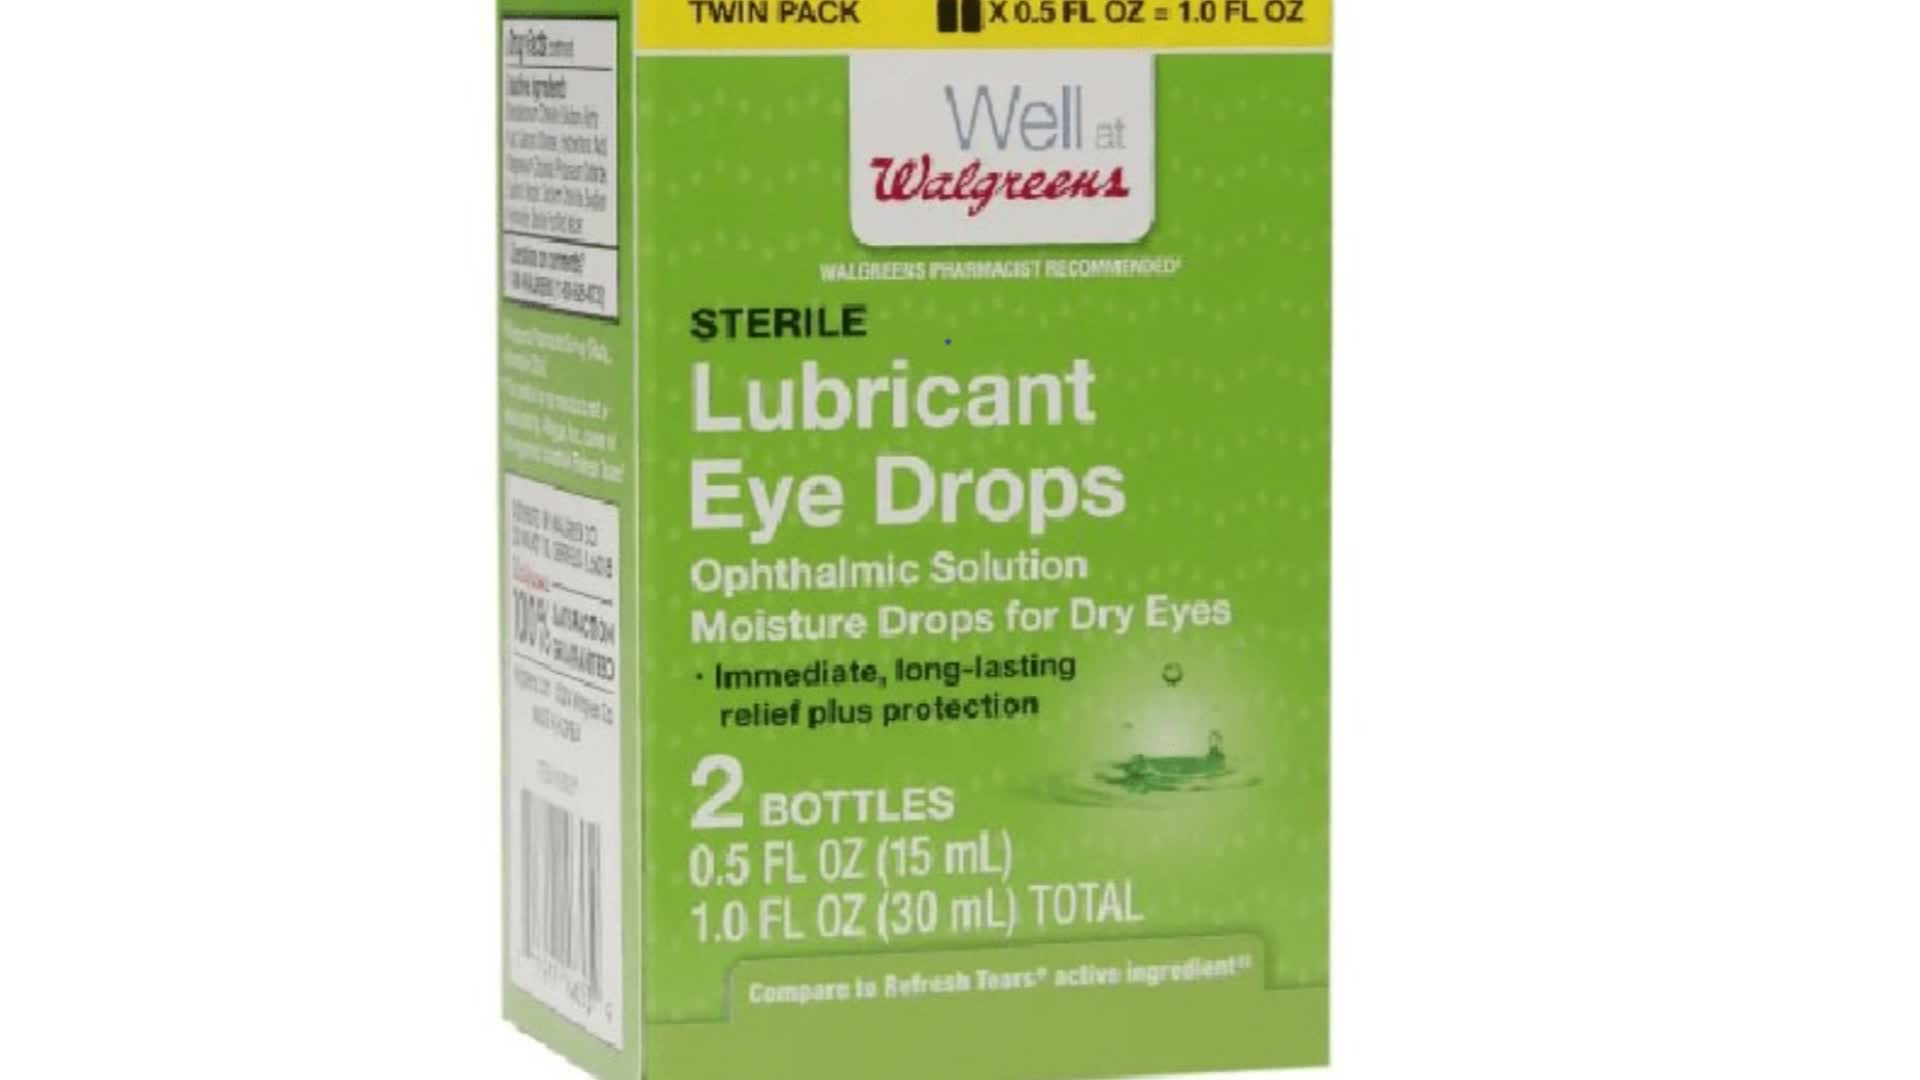 Eye drops, ointments sold at Walgreens, Walmart recalled